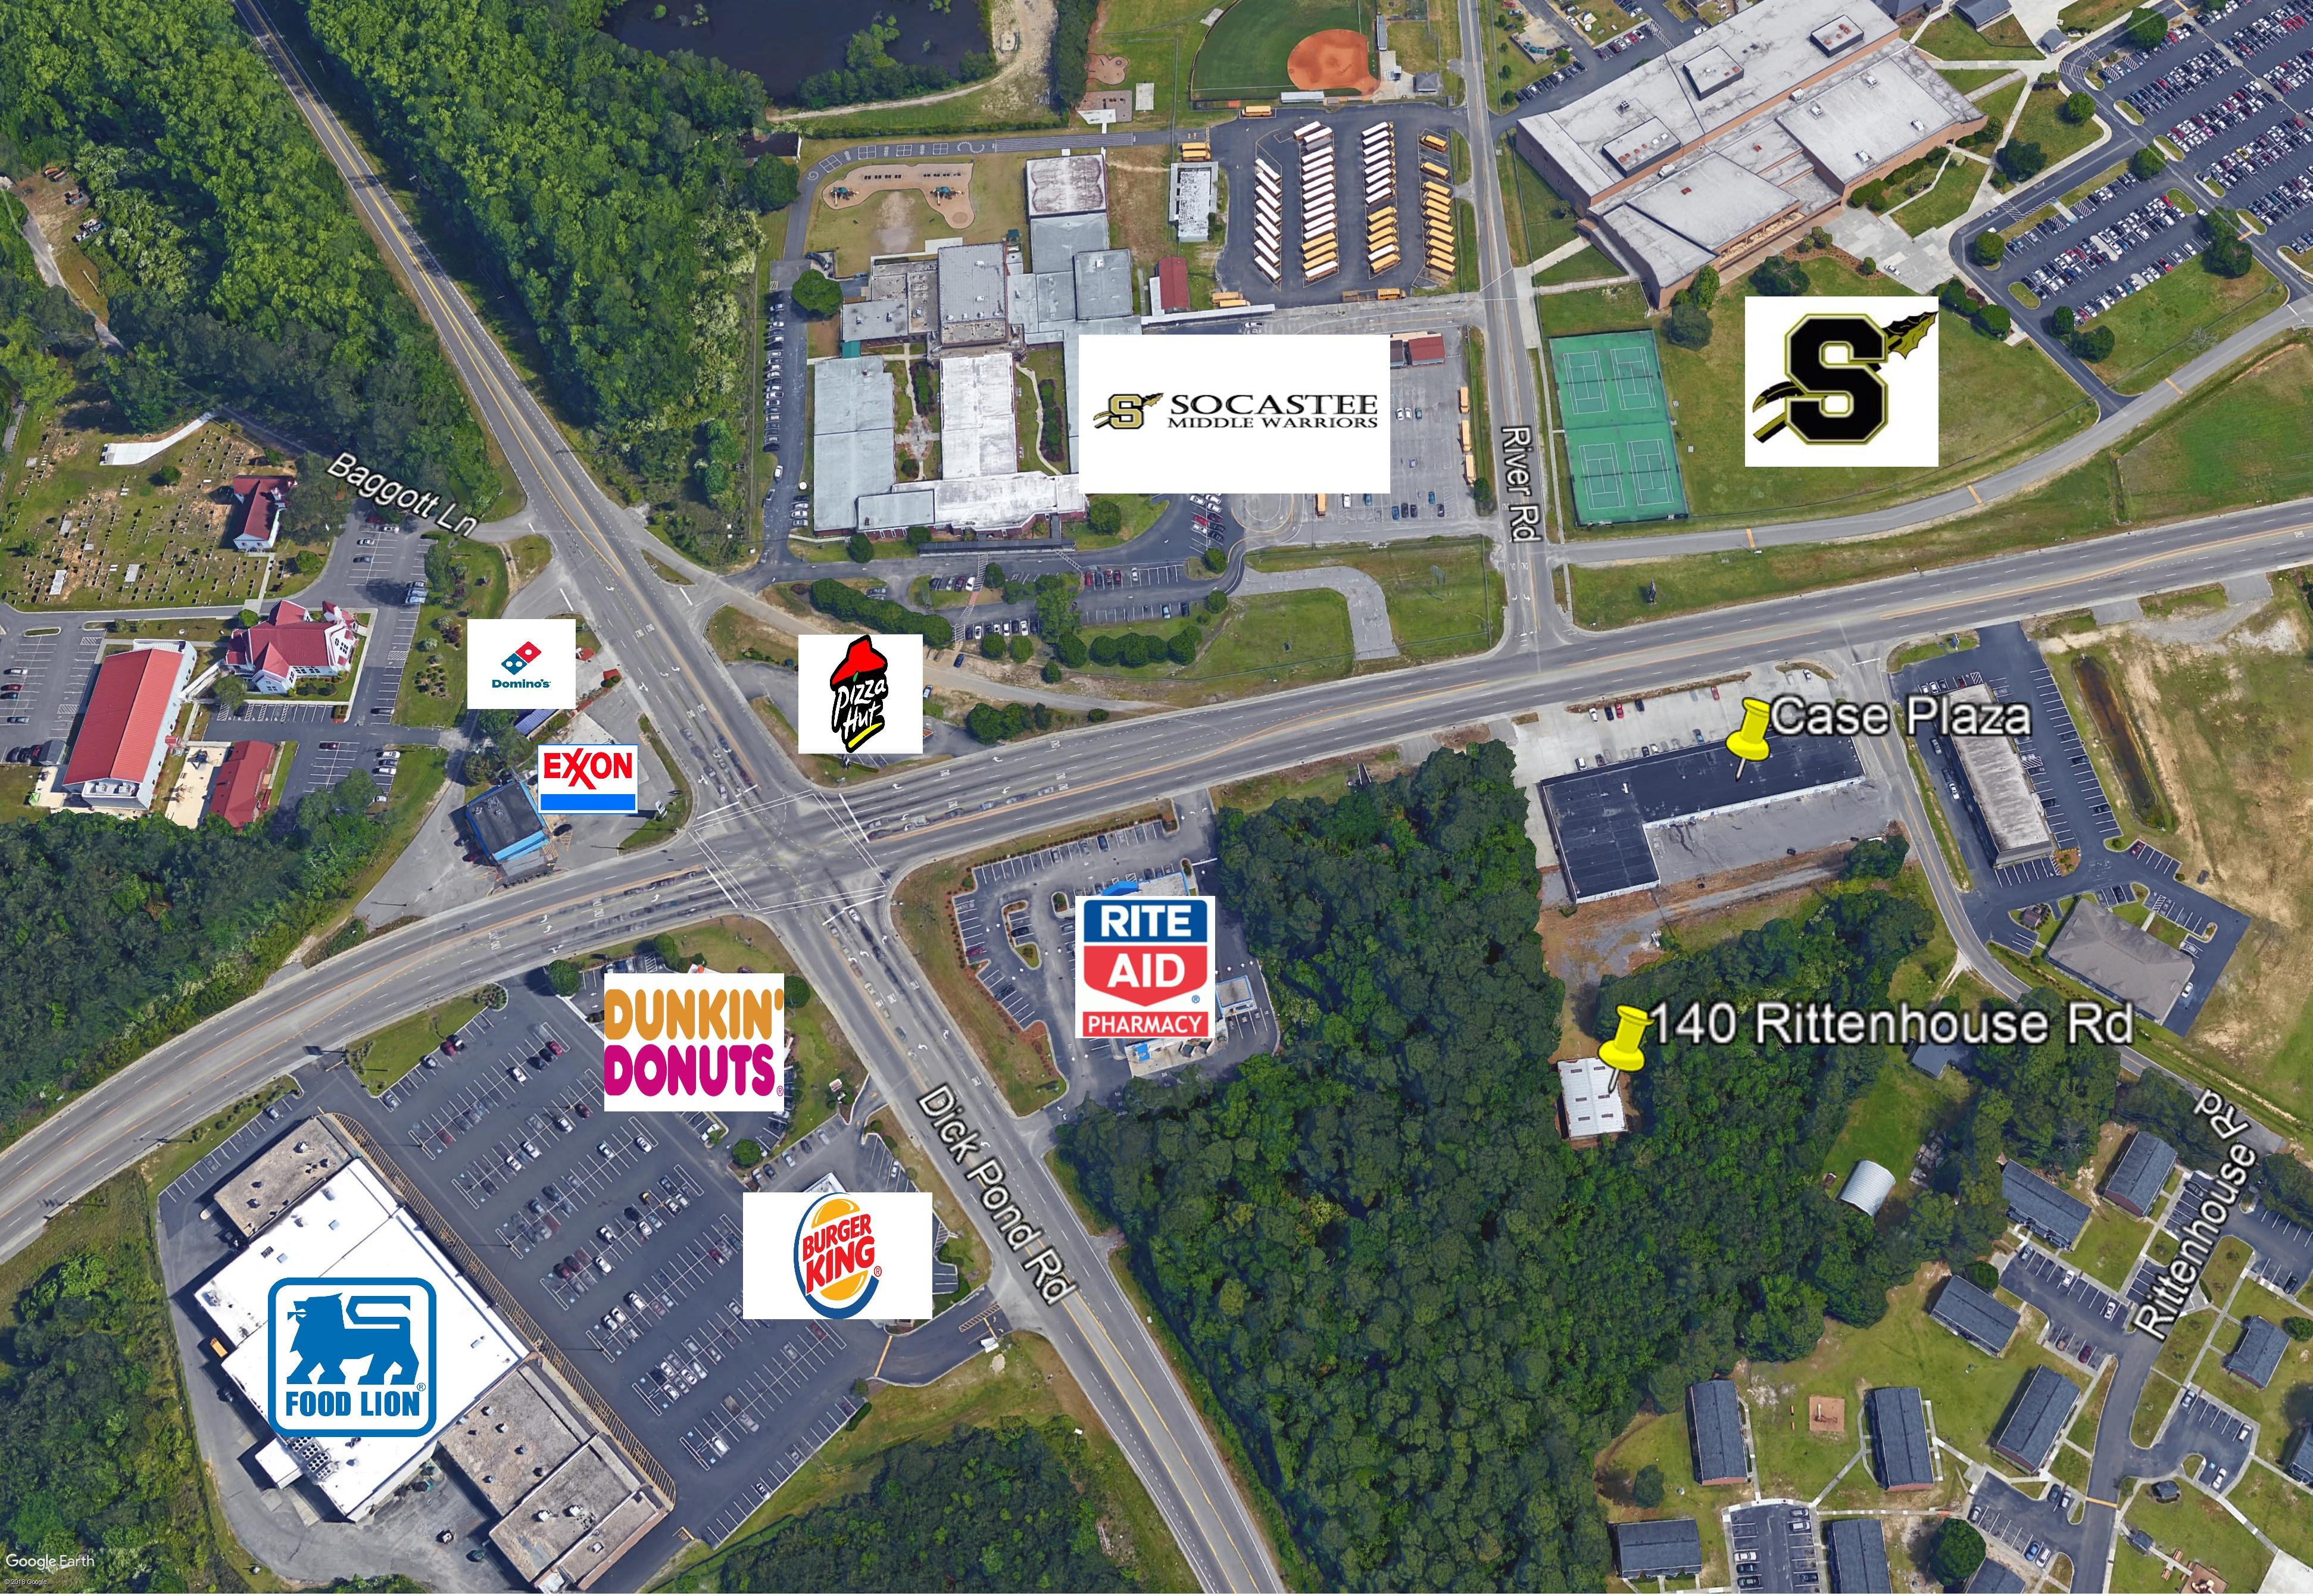 140 Rittenhouse Road,Socastee,South Carolina,29588,Industrial / Flex,Rittenhouse Road,1414